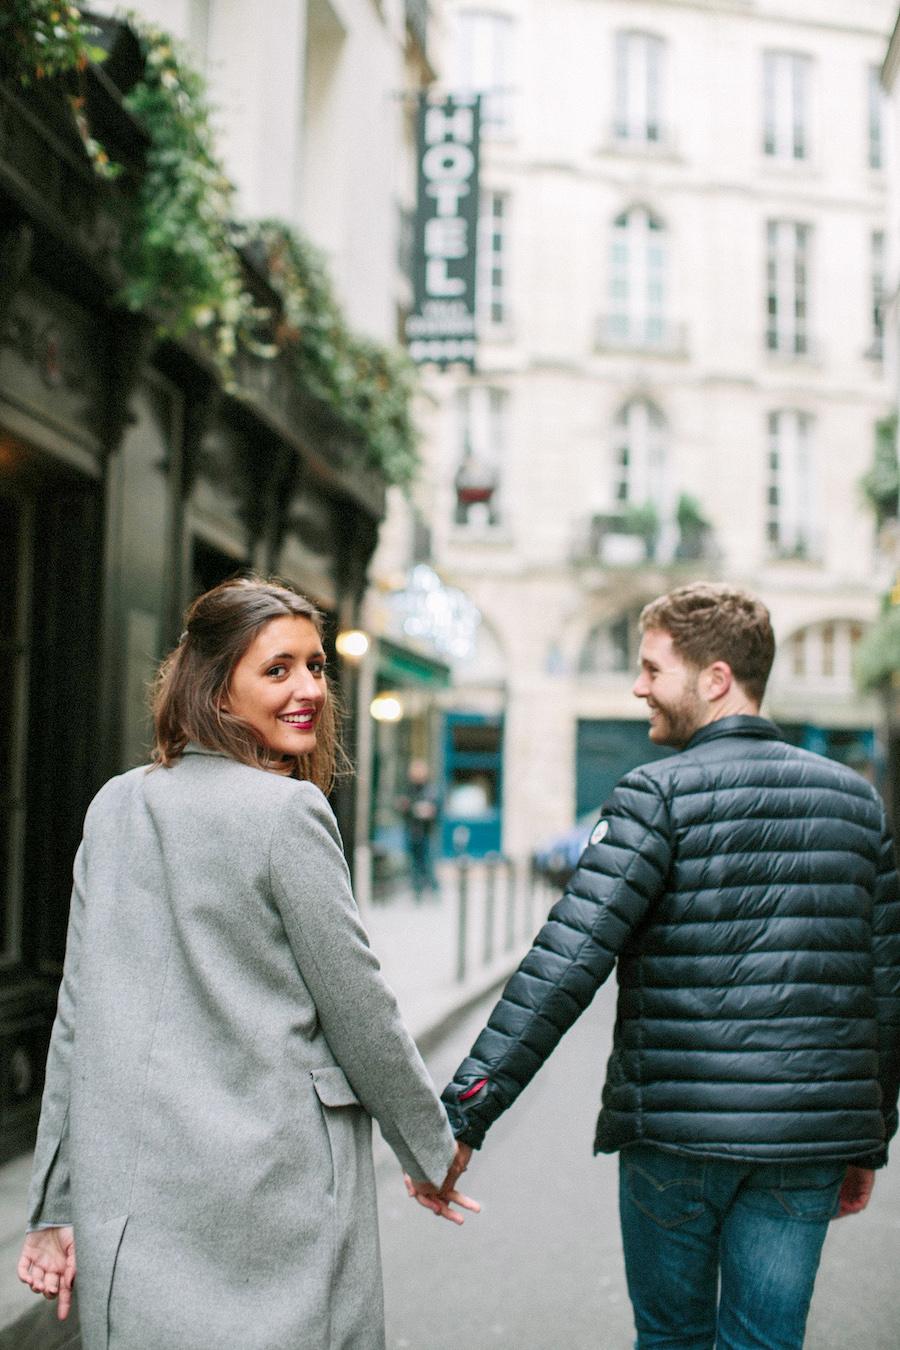 saya-photography-pre-wedding-couple-engagement-paris-quartier-latin-17.jpg